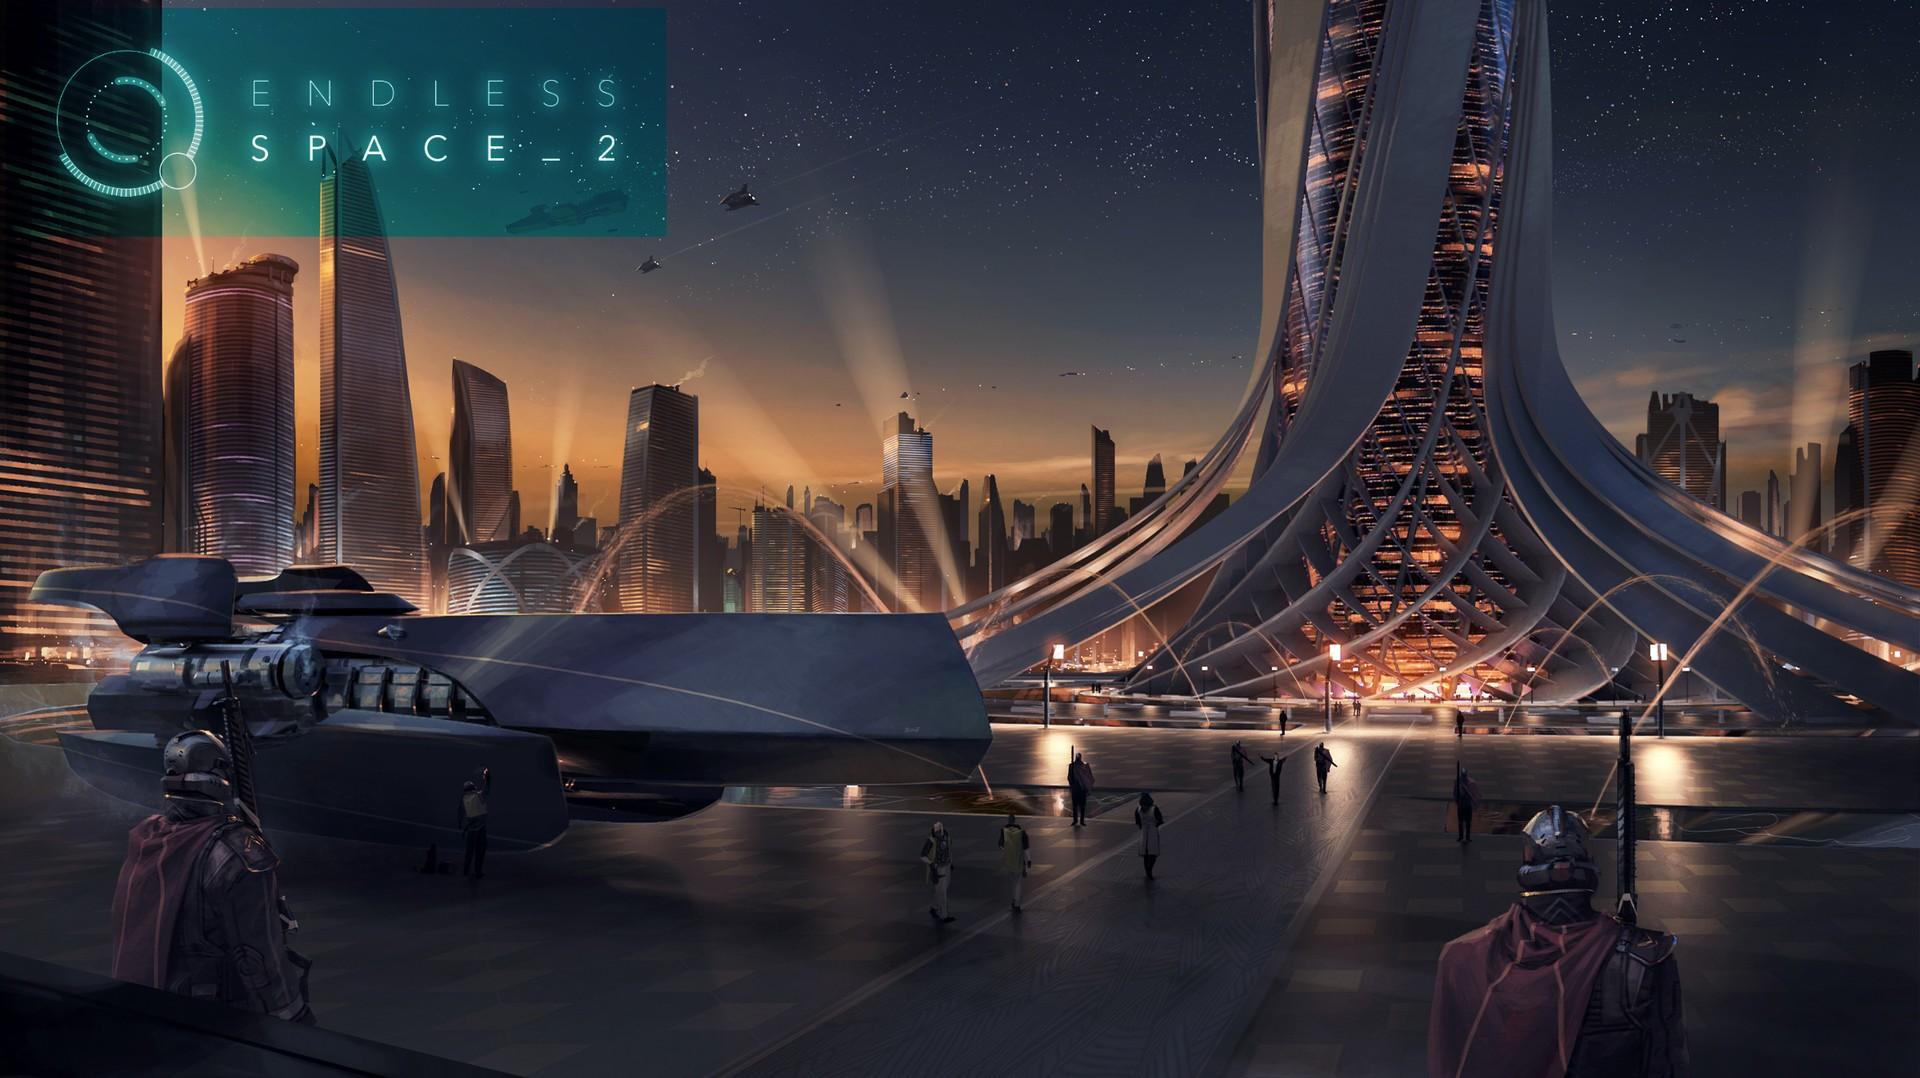 Buy Endless Space 2 Steam